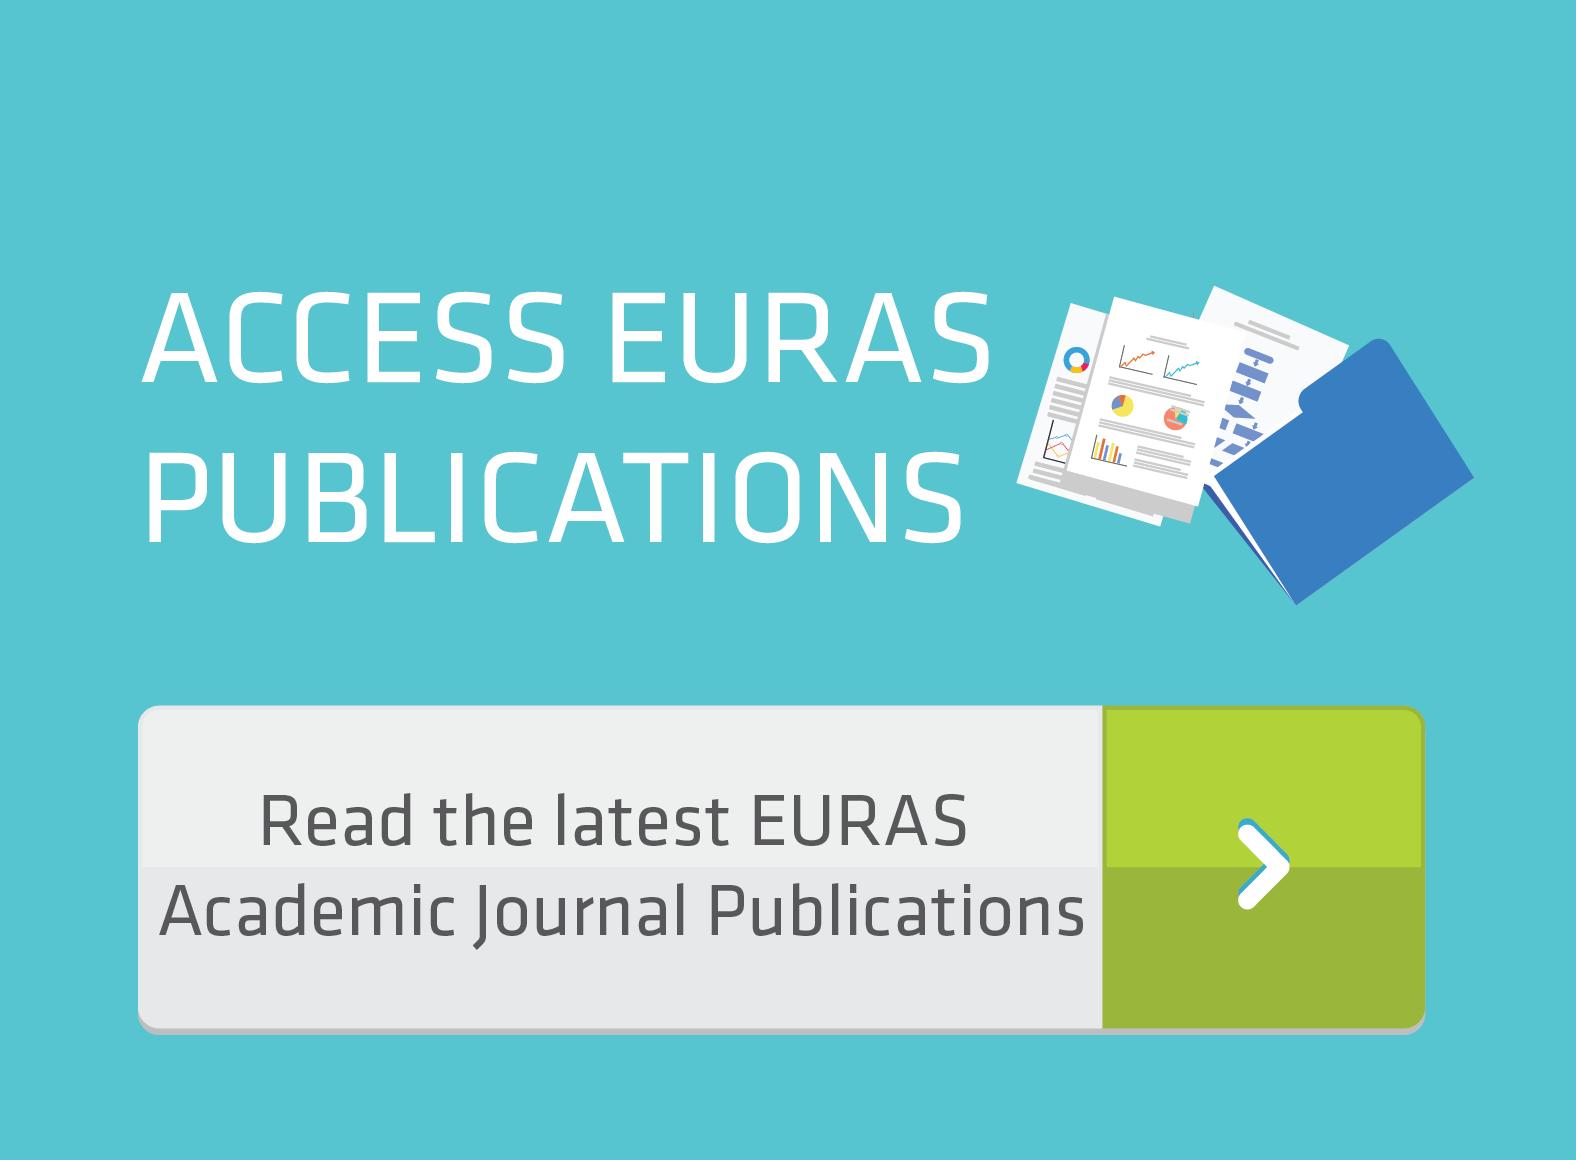 ACCESS EURAS PUBLICATIONS